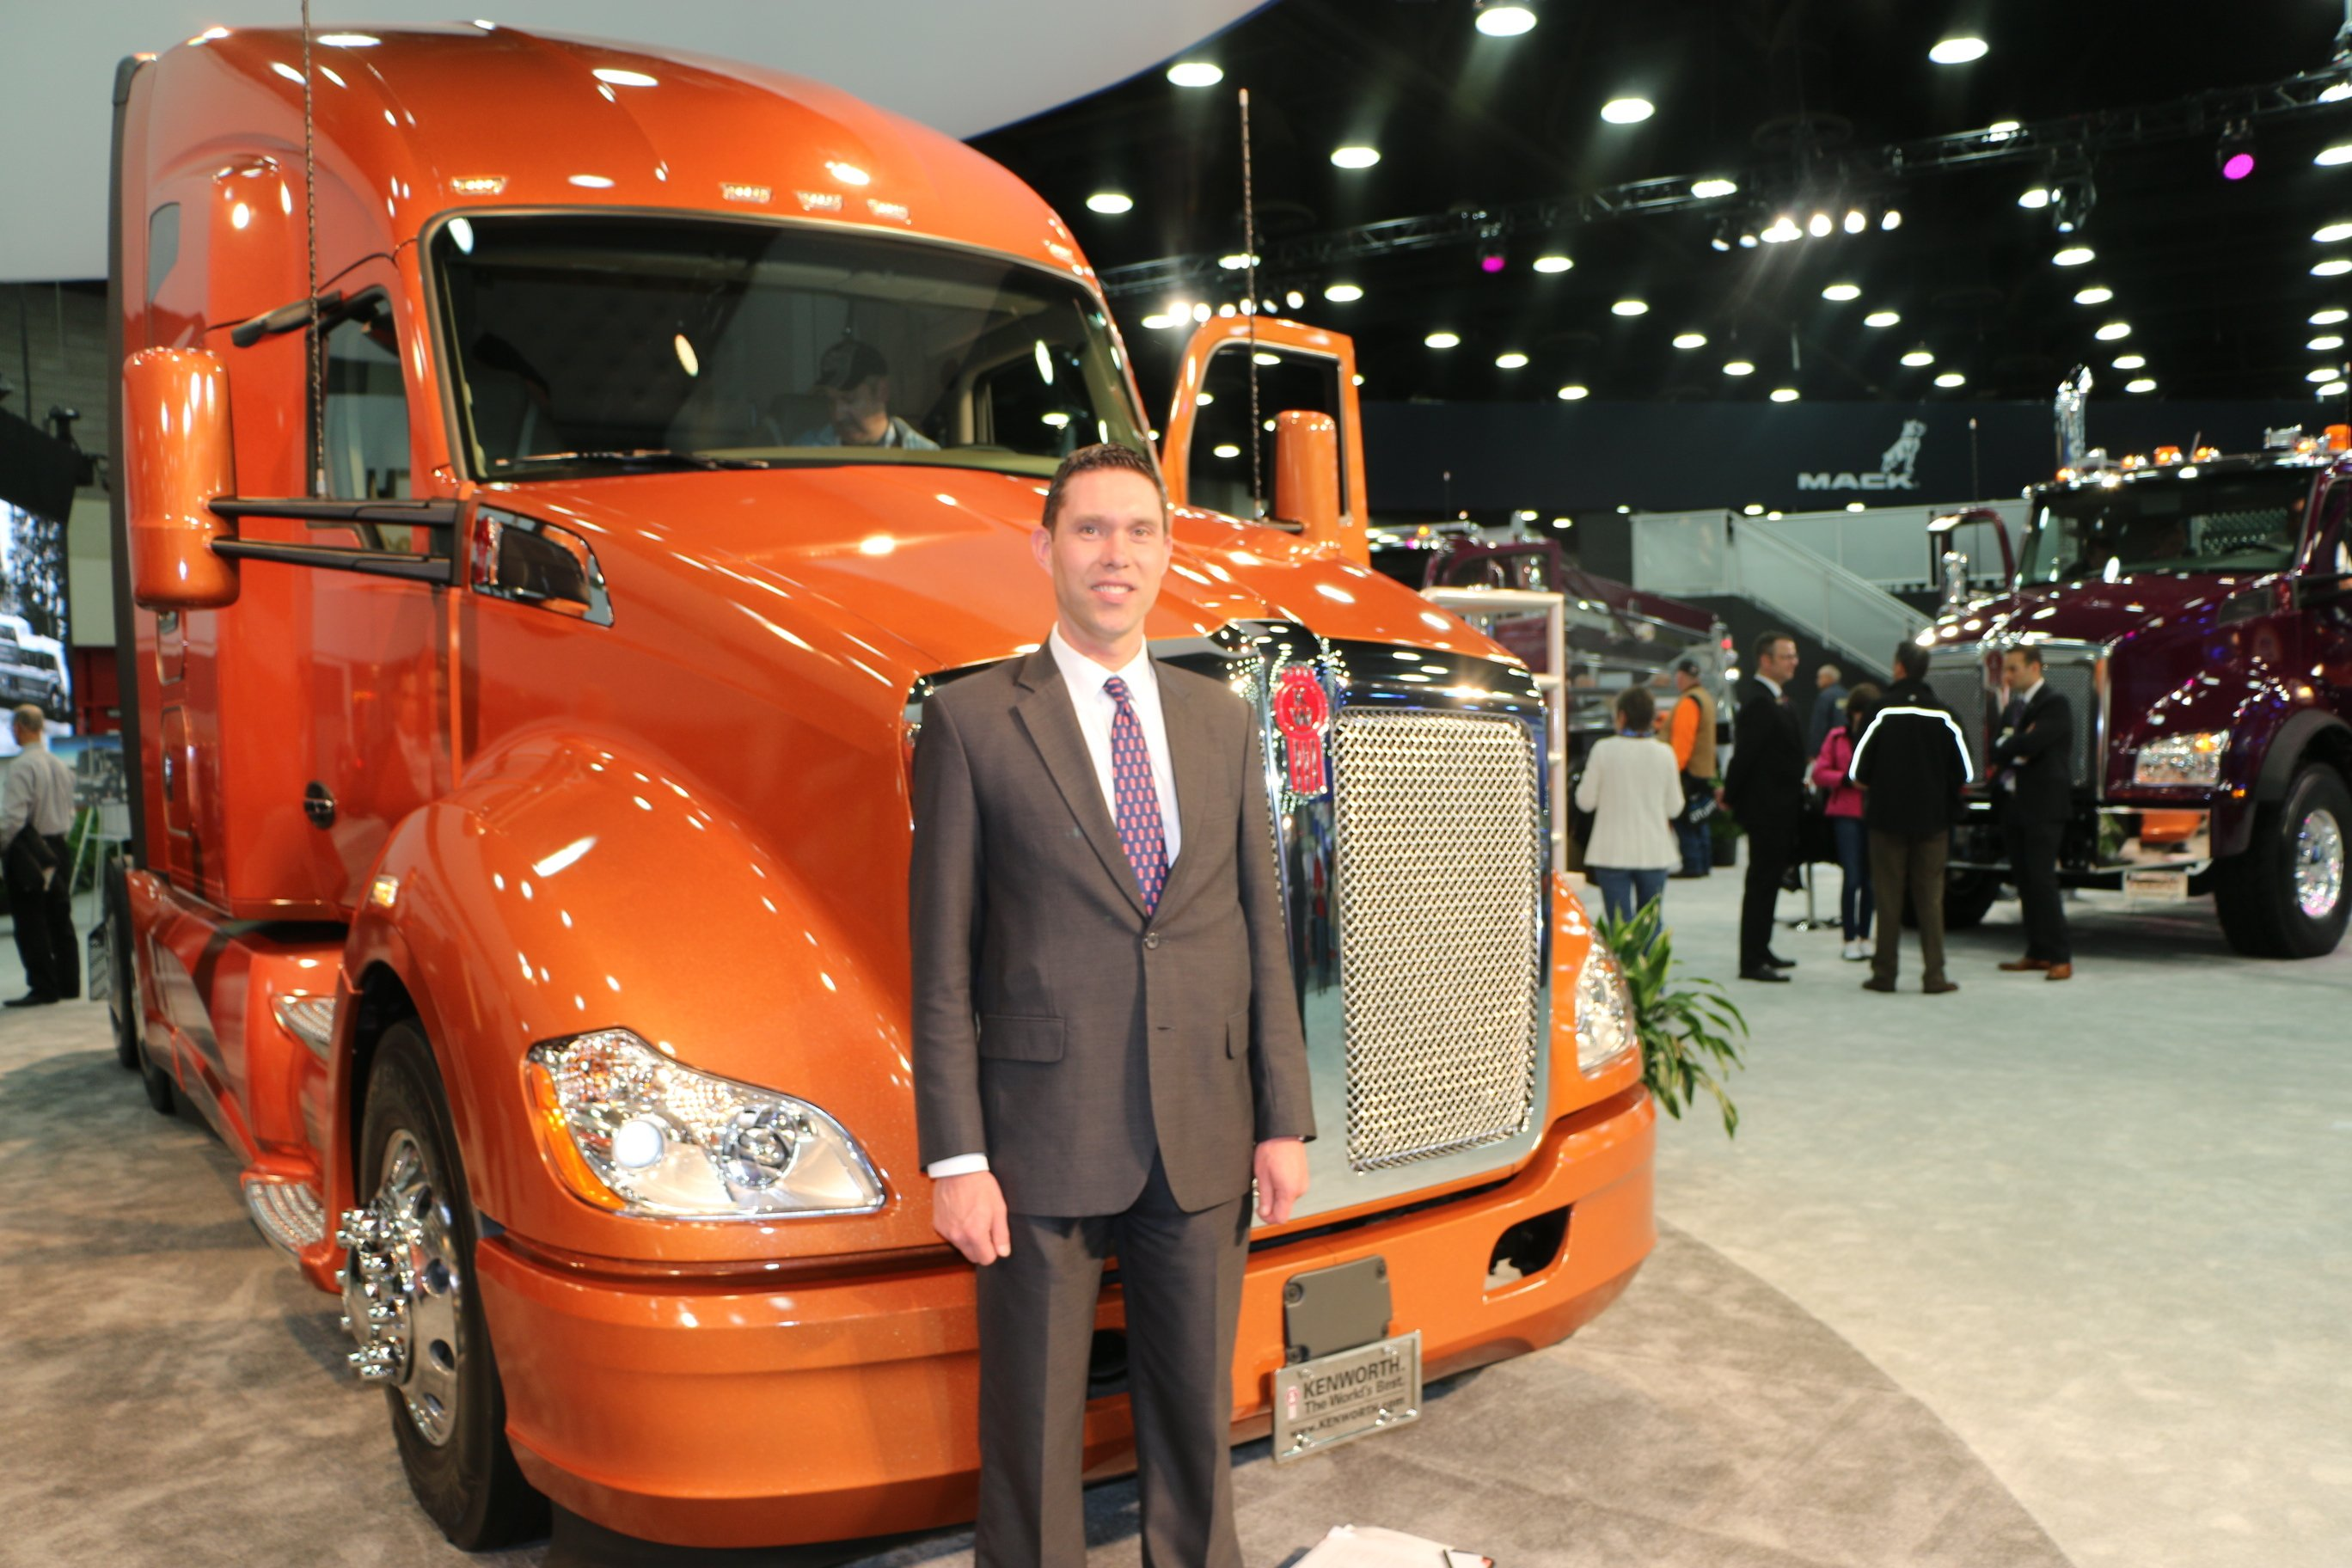 New Paint Color Developed for Kenworth Trucks